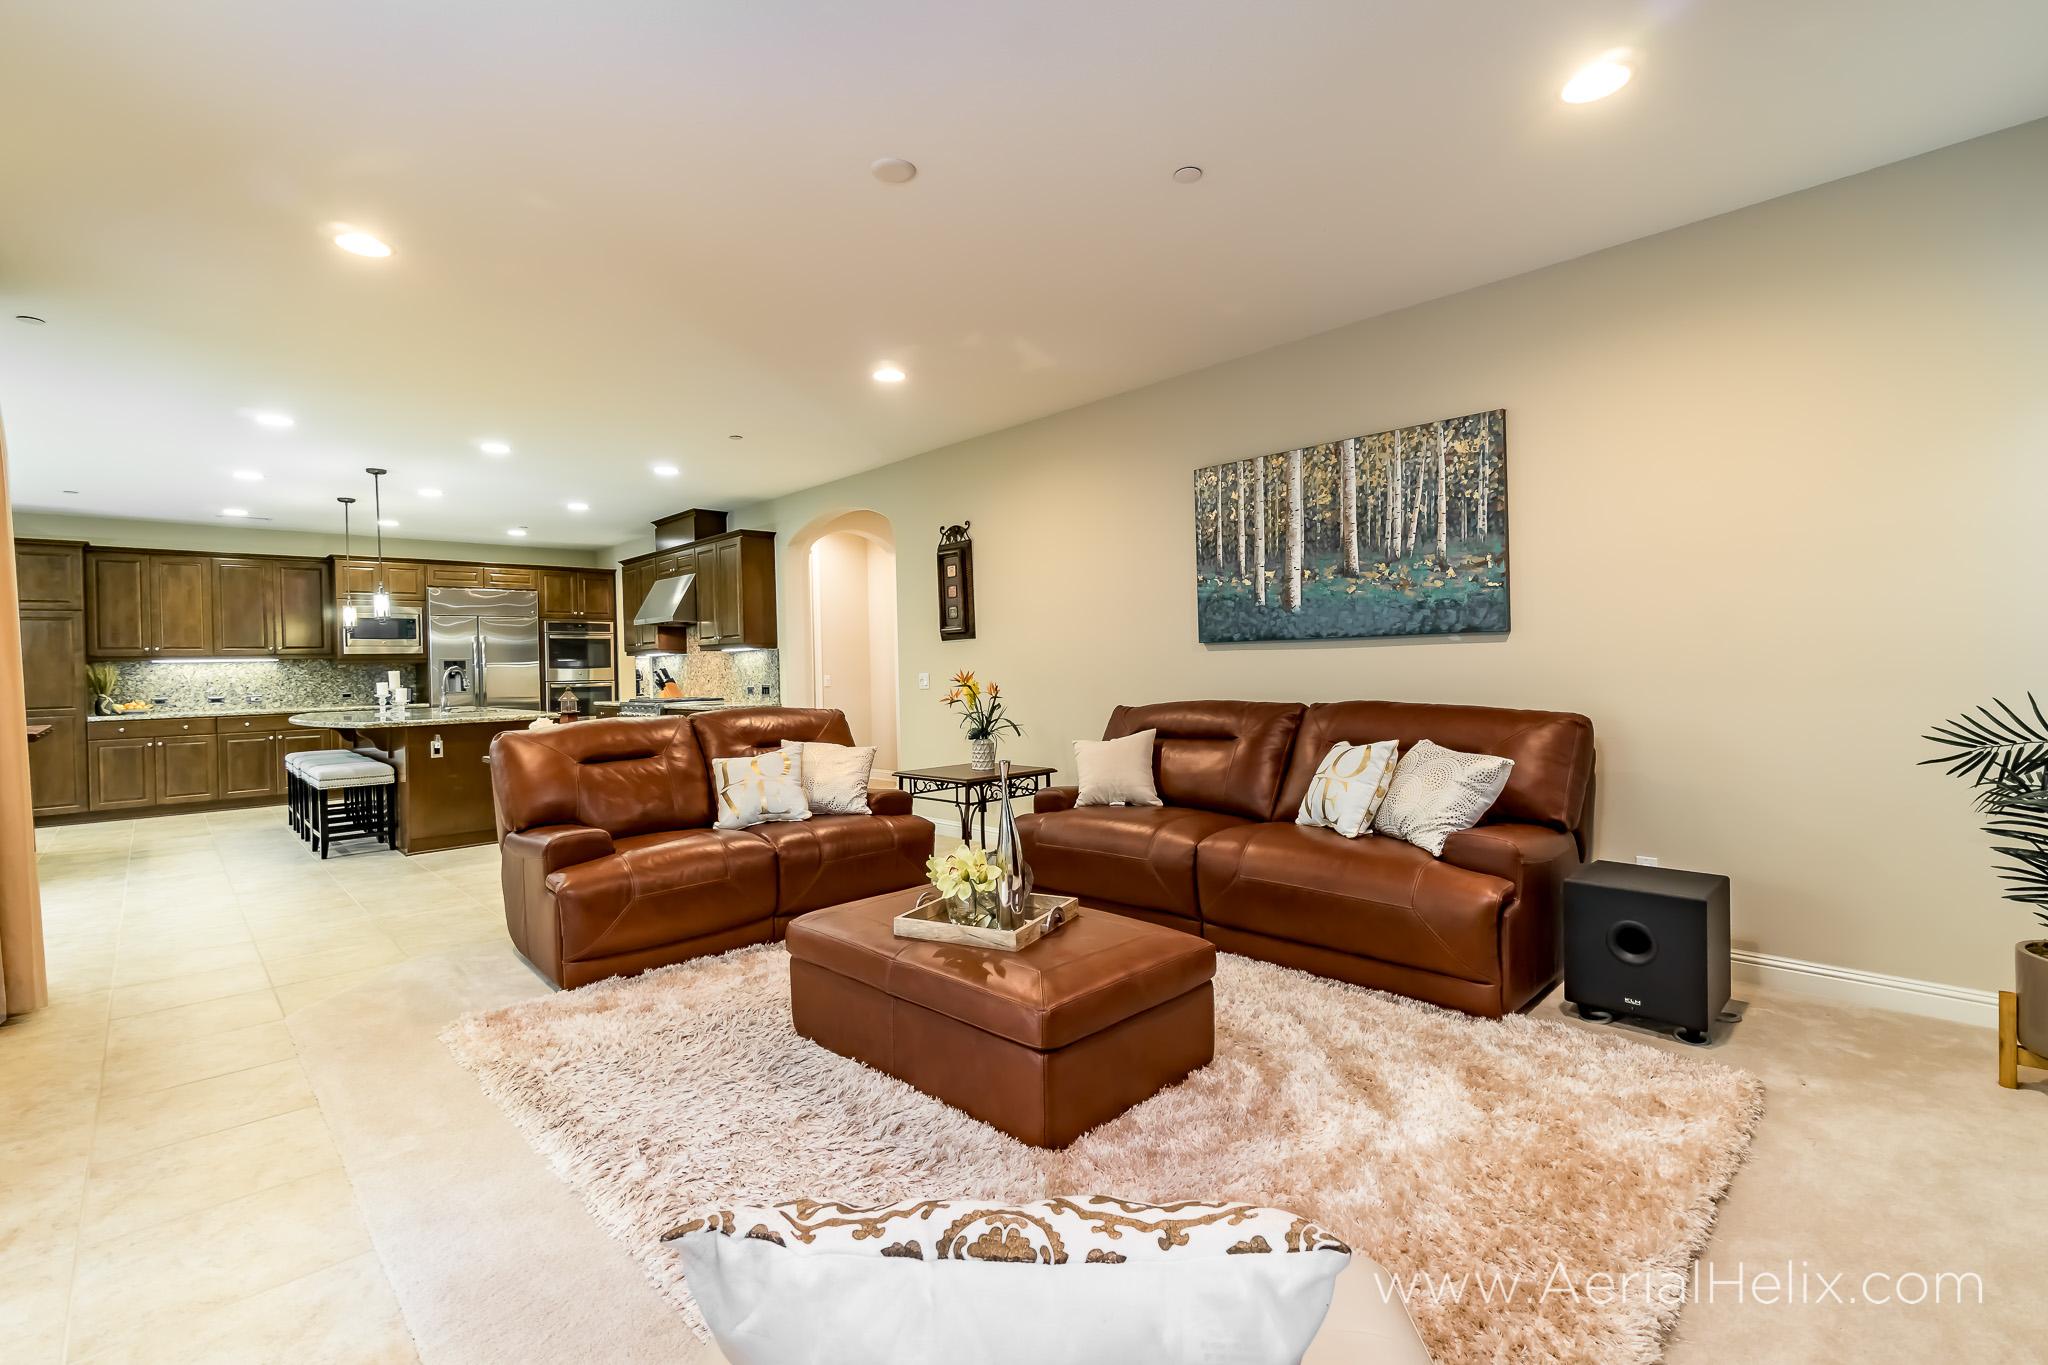 Chianti Ct Interior - Real Estate Photographer-17.jpg